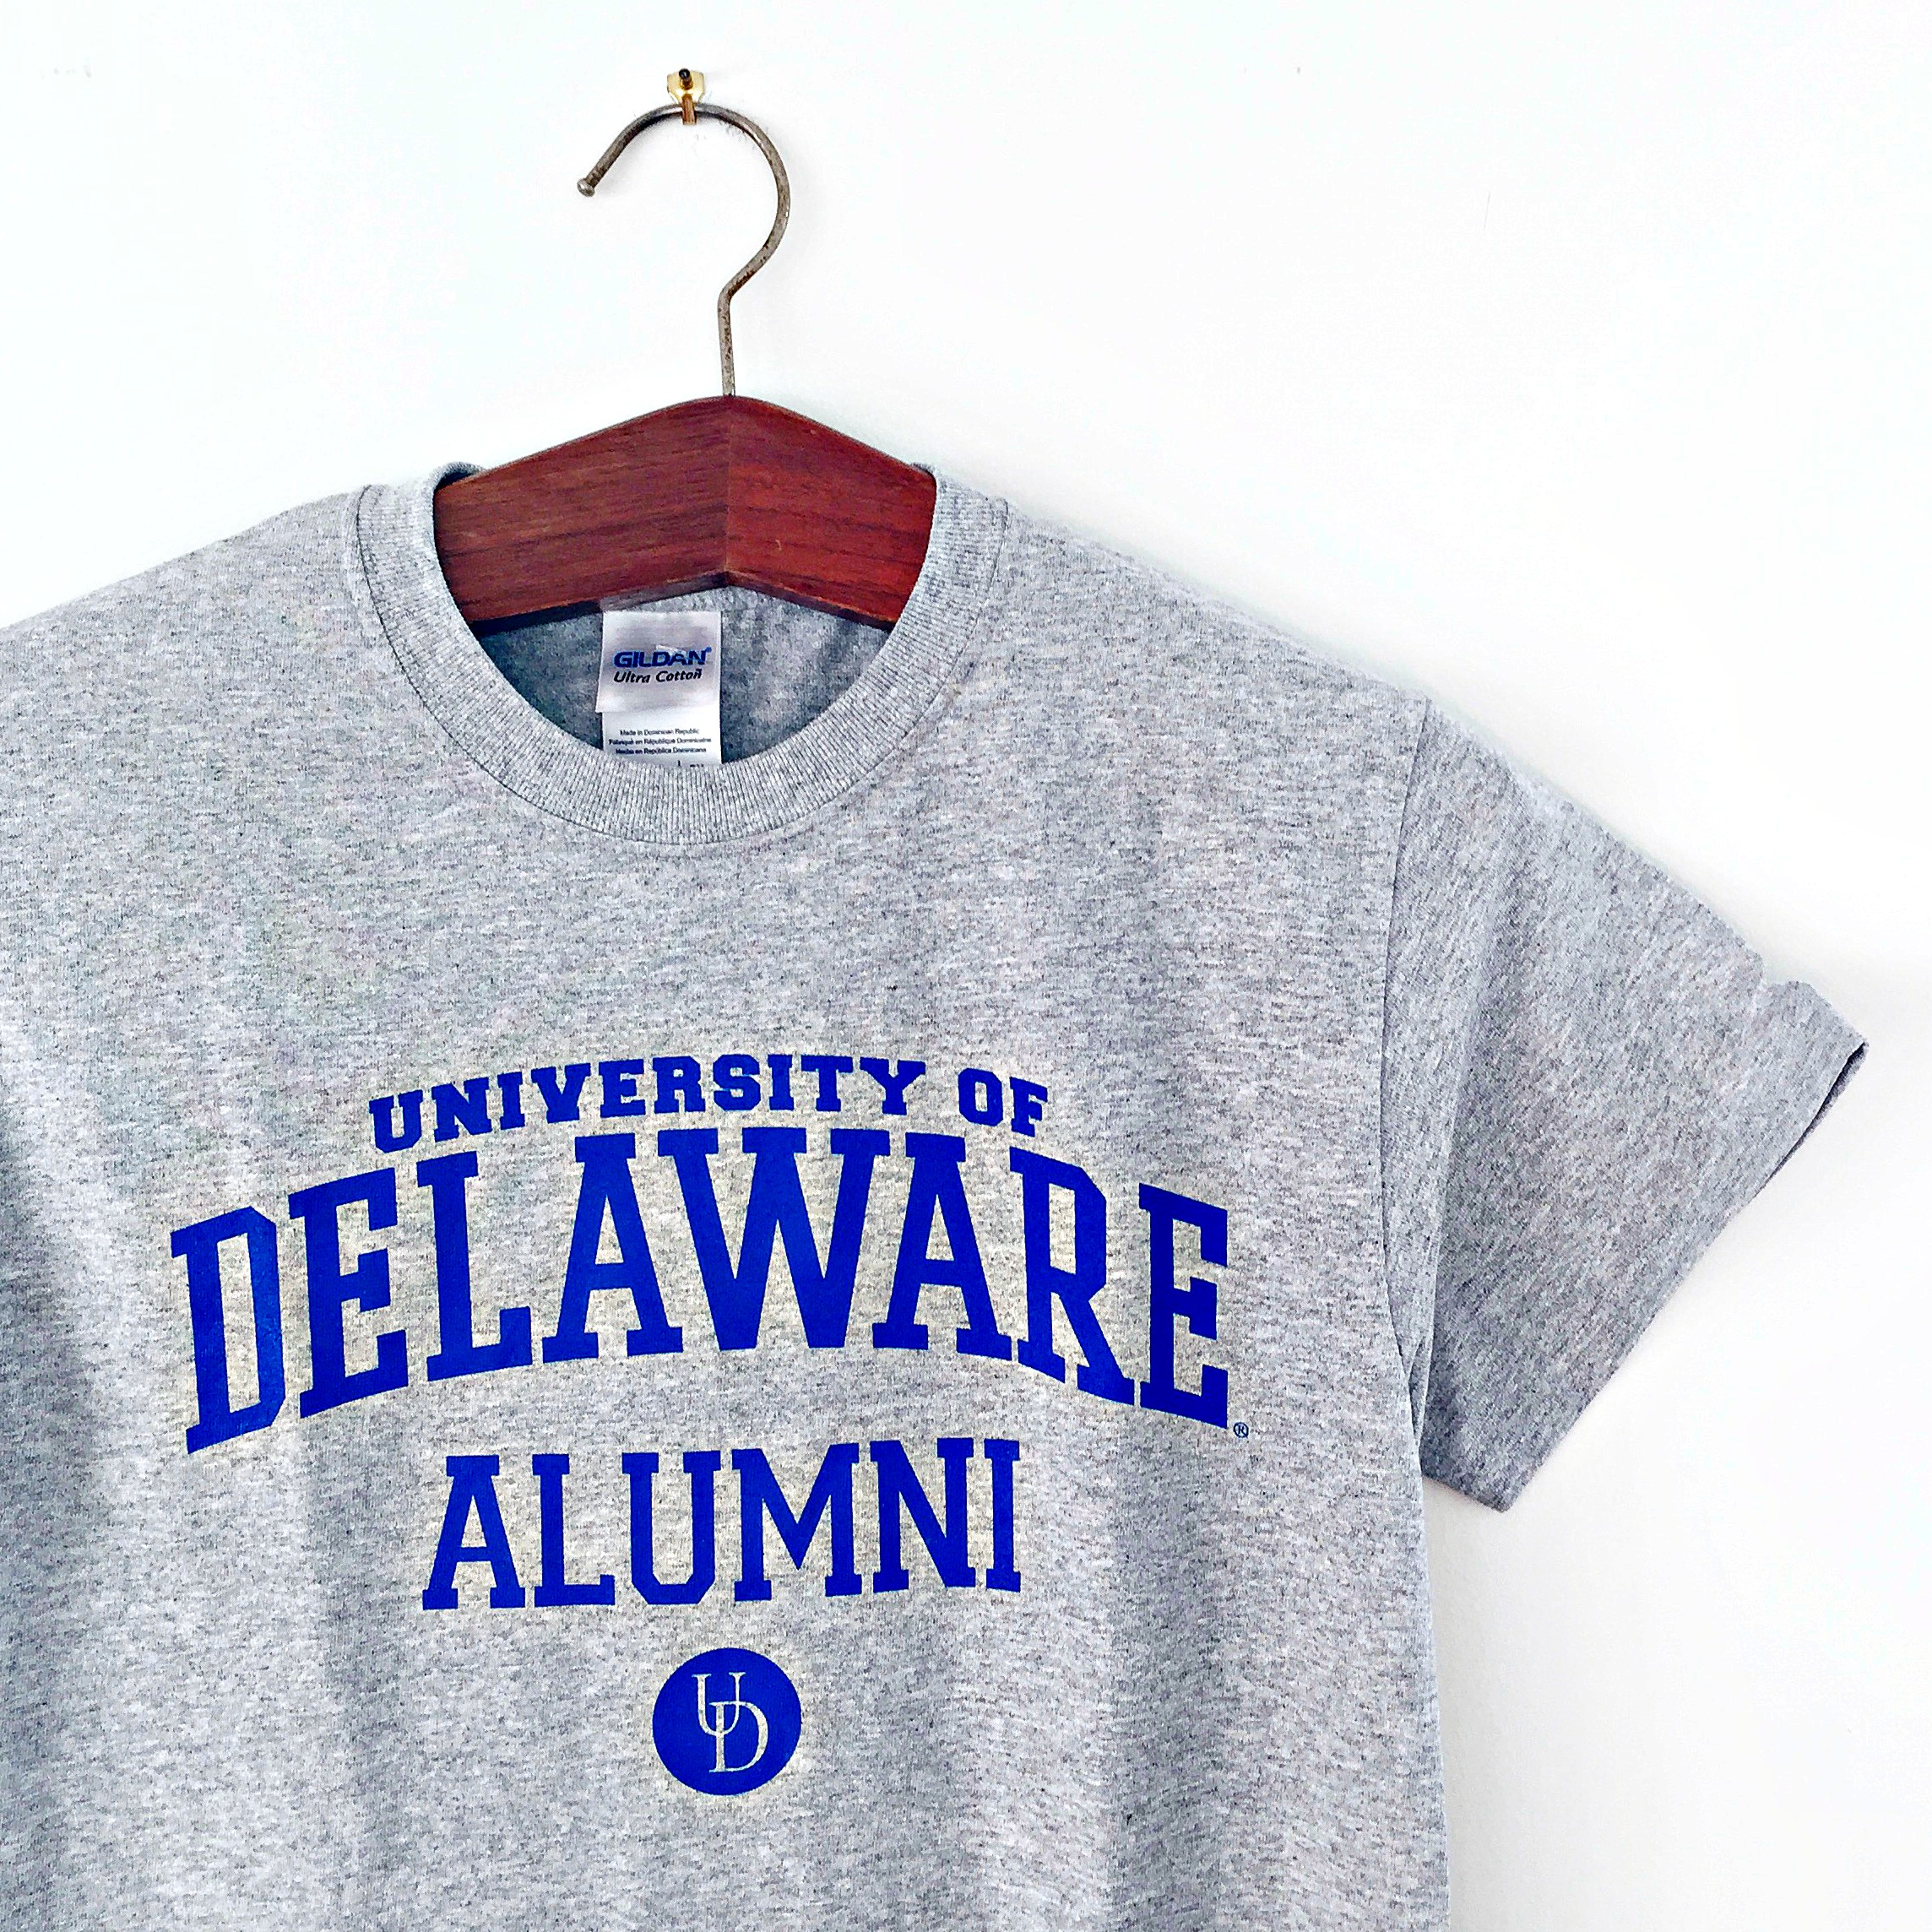 University of delaware alumni t shirt oxford national for T shirt printing oxford